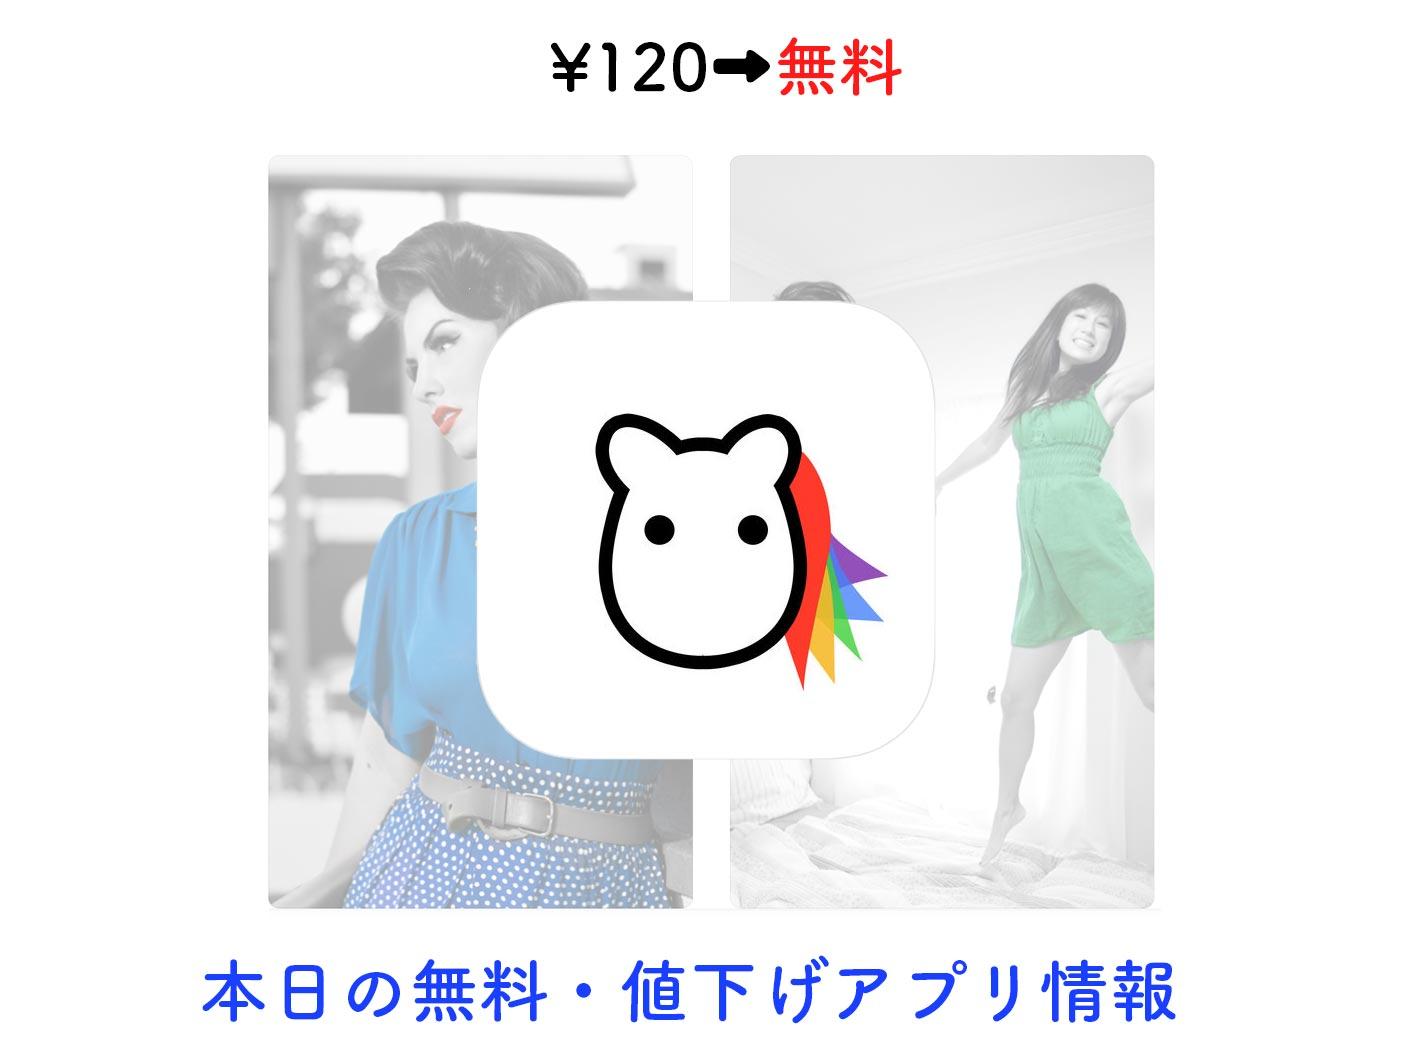 Appsale0712